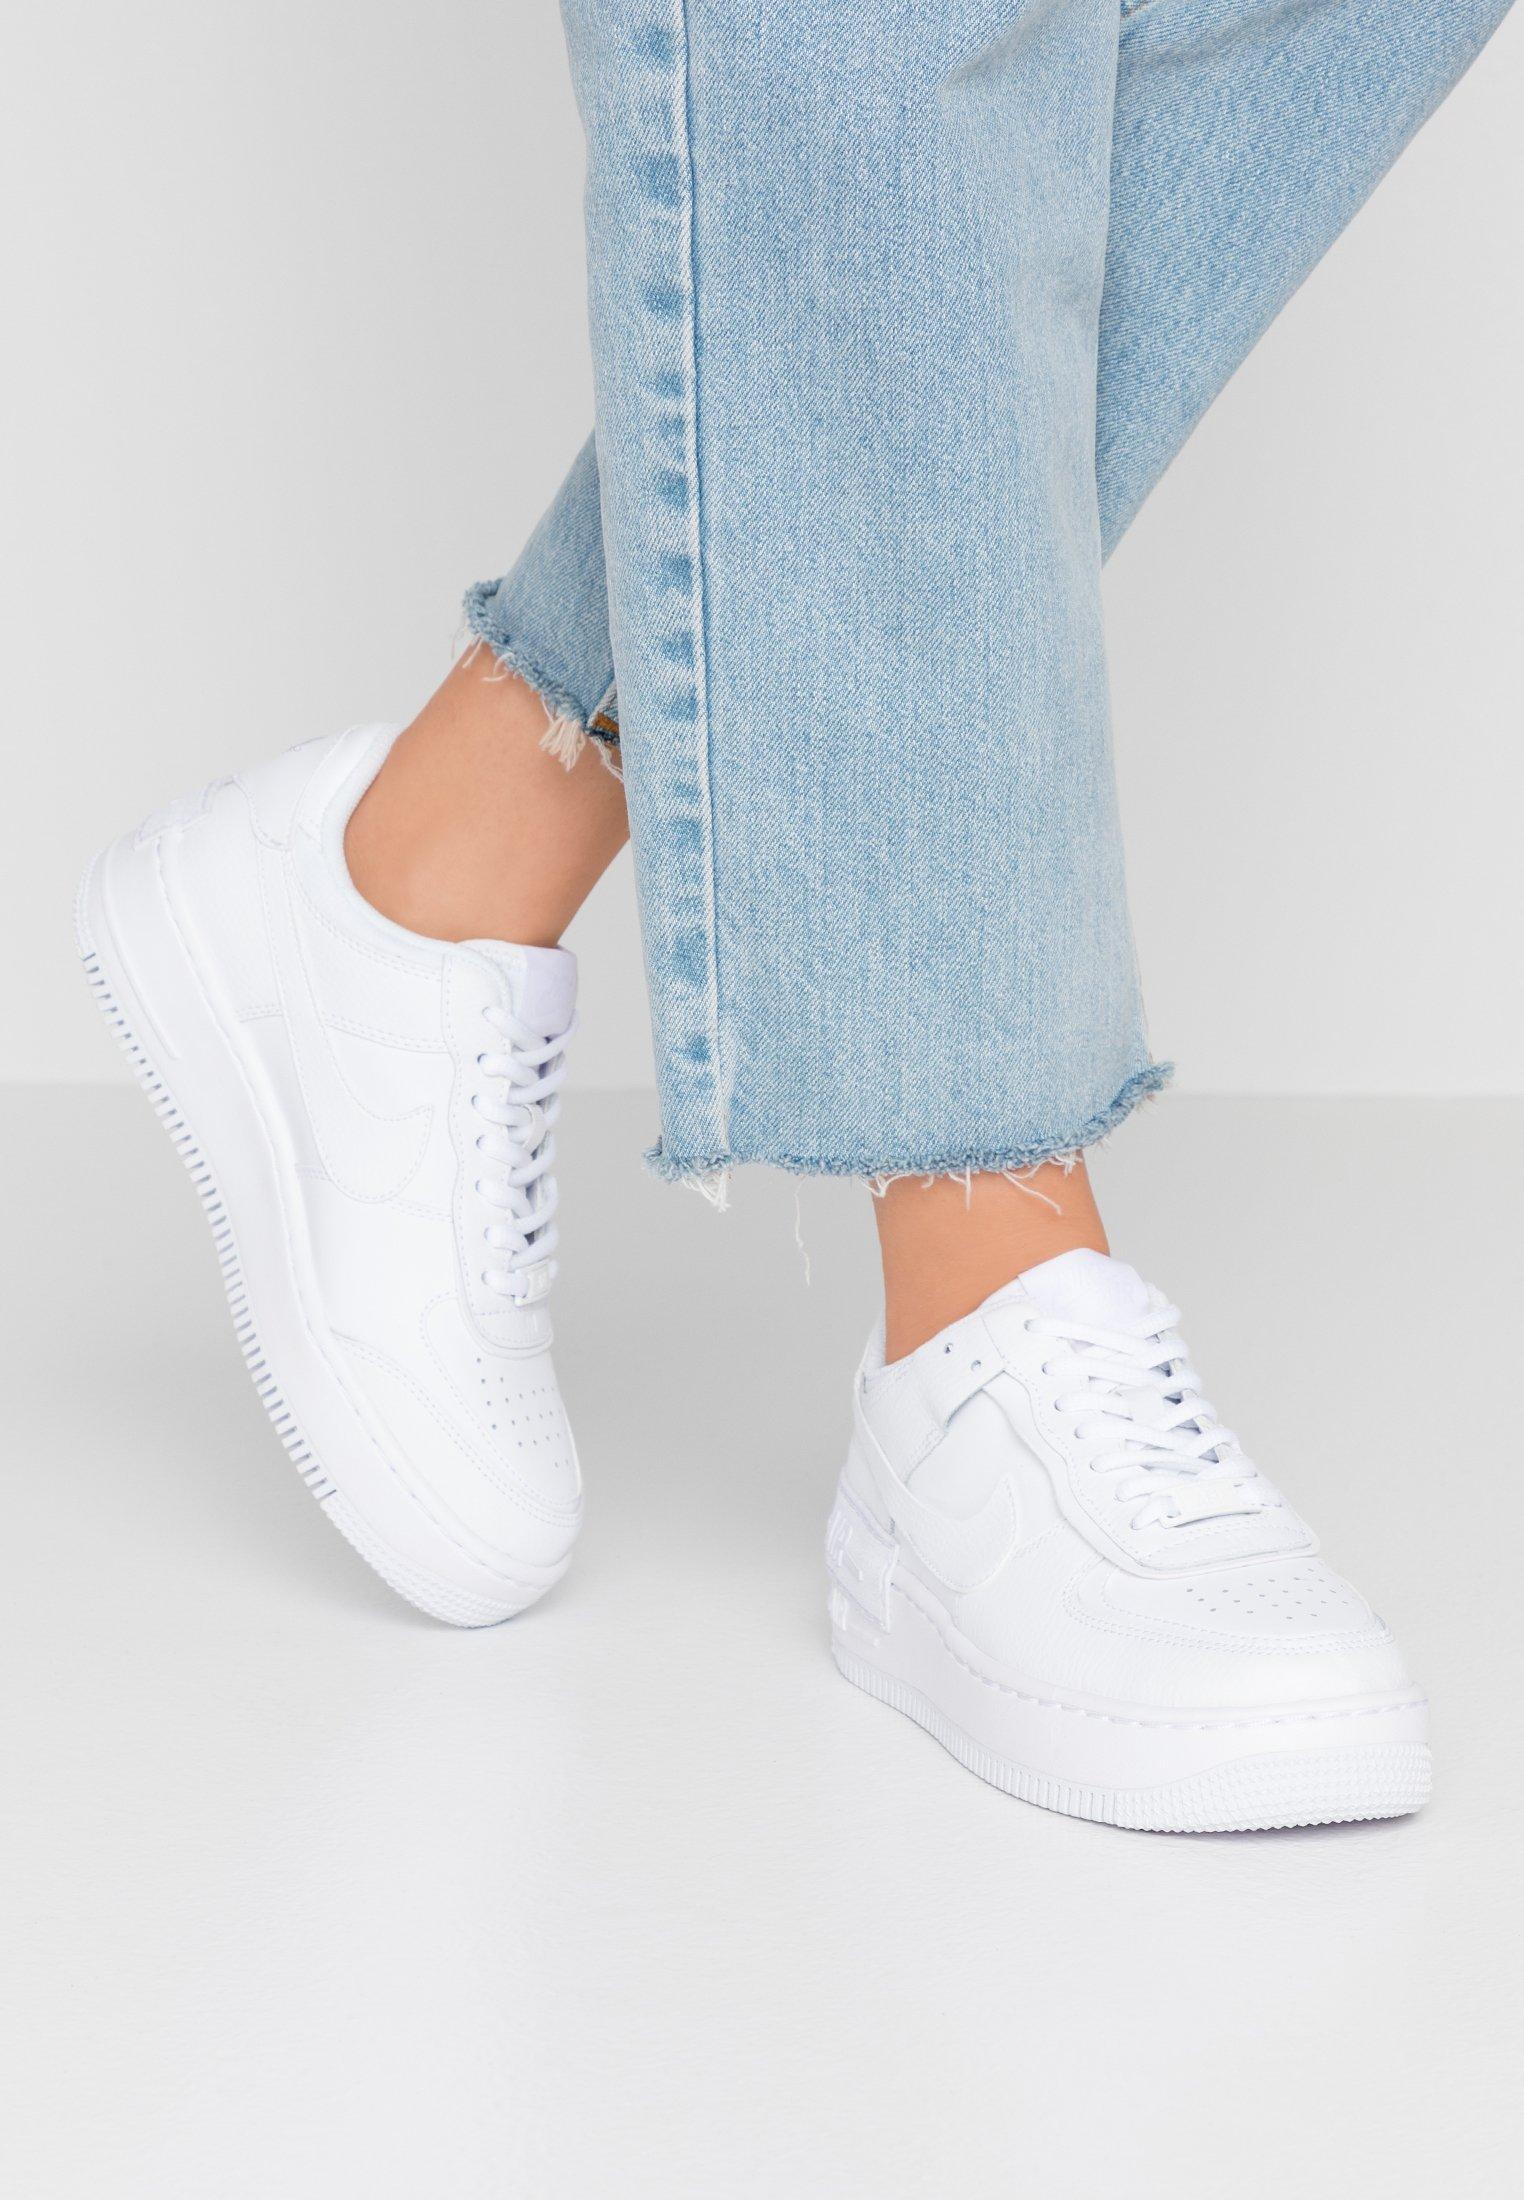 Nike Sportswear Air Force 1 Shadow Zapatillas White Blanco Zalando Es Nike air force 1 '07 se 女子運動鞋. air force 1 shadow zapatillas white